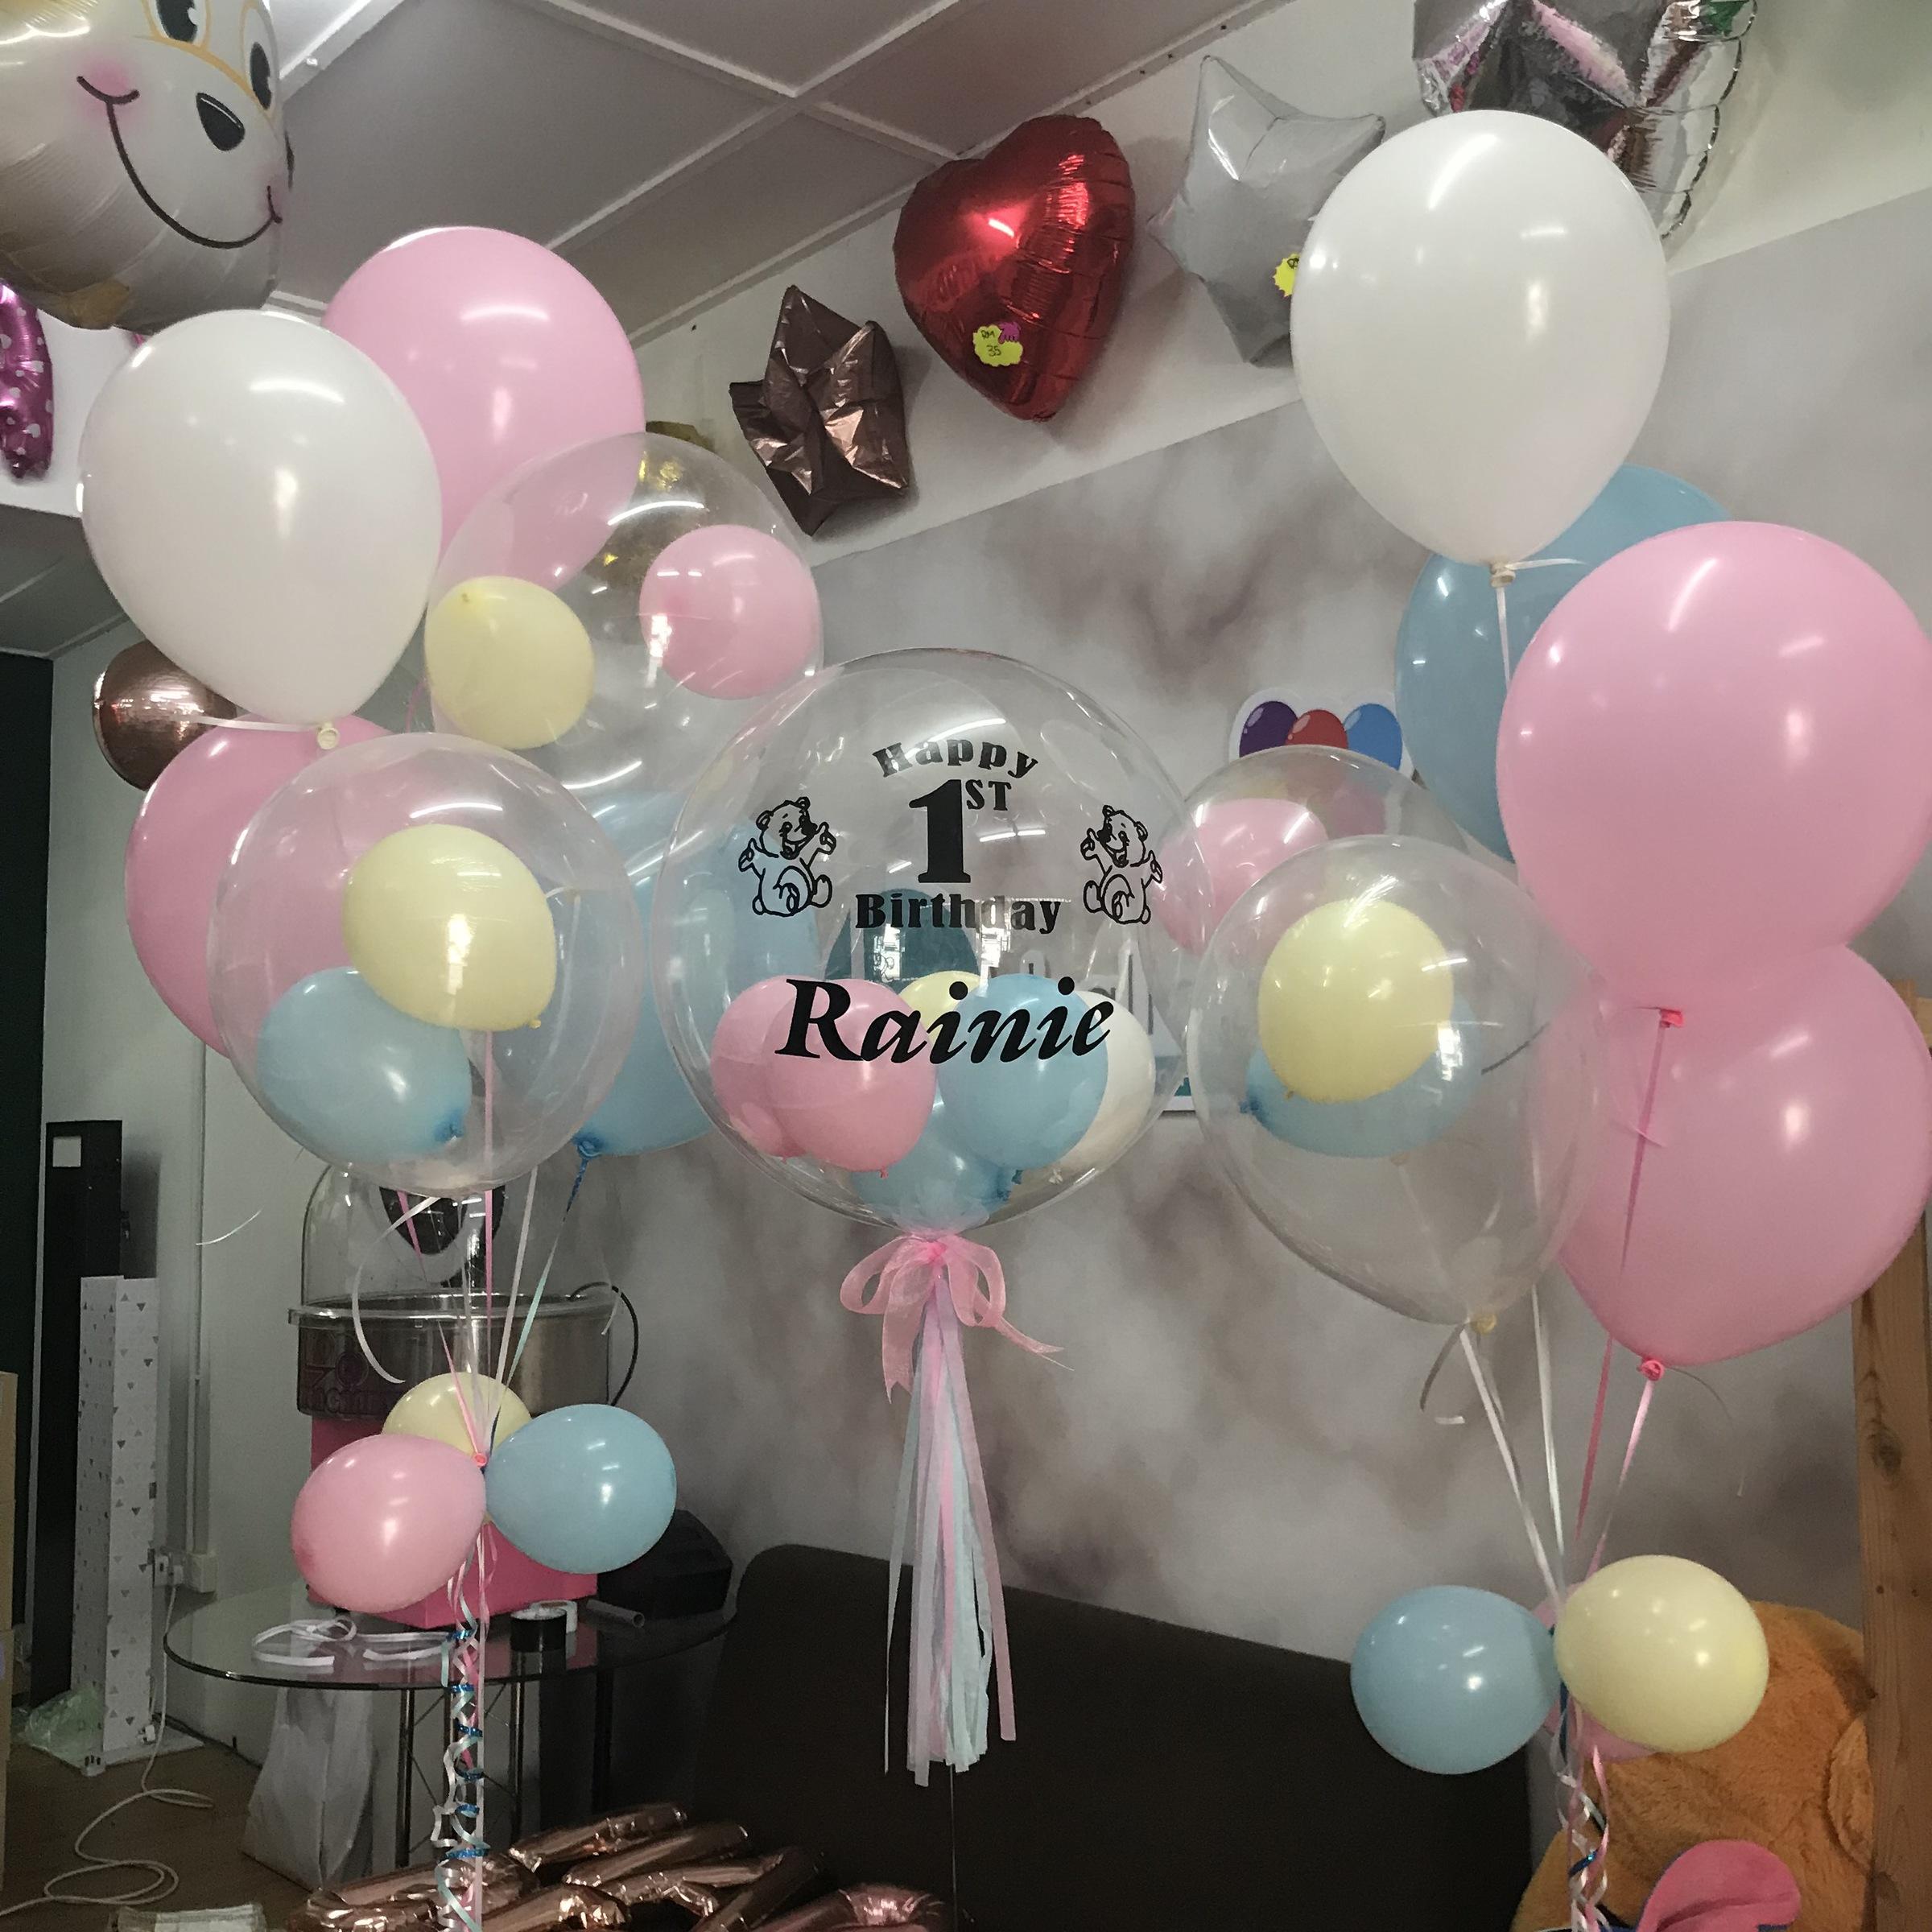 Happy 1st Birthday Pastel Bundle Large.JPG